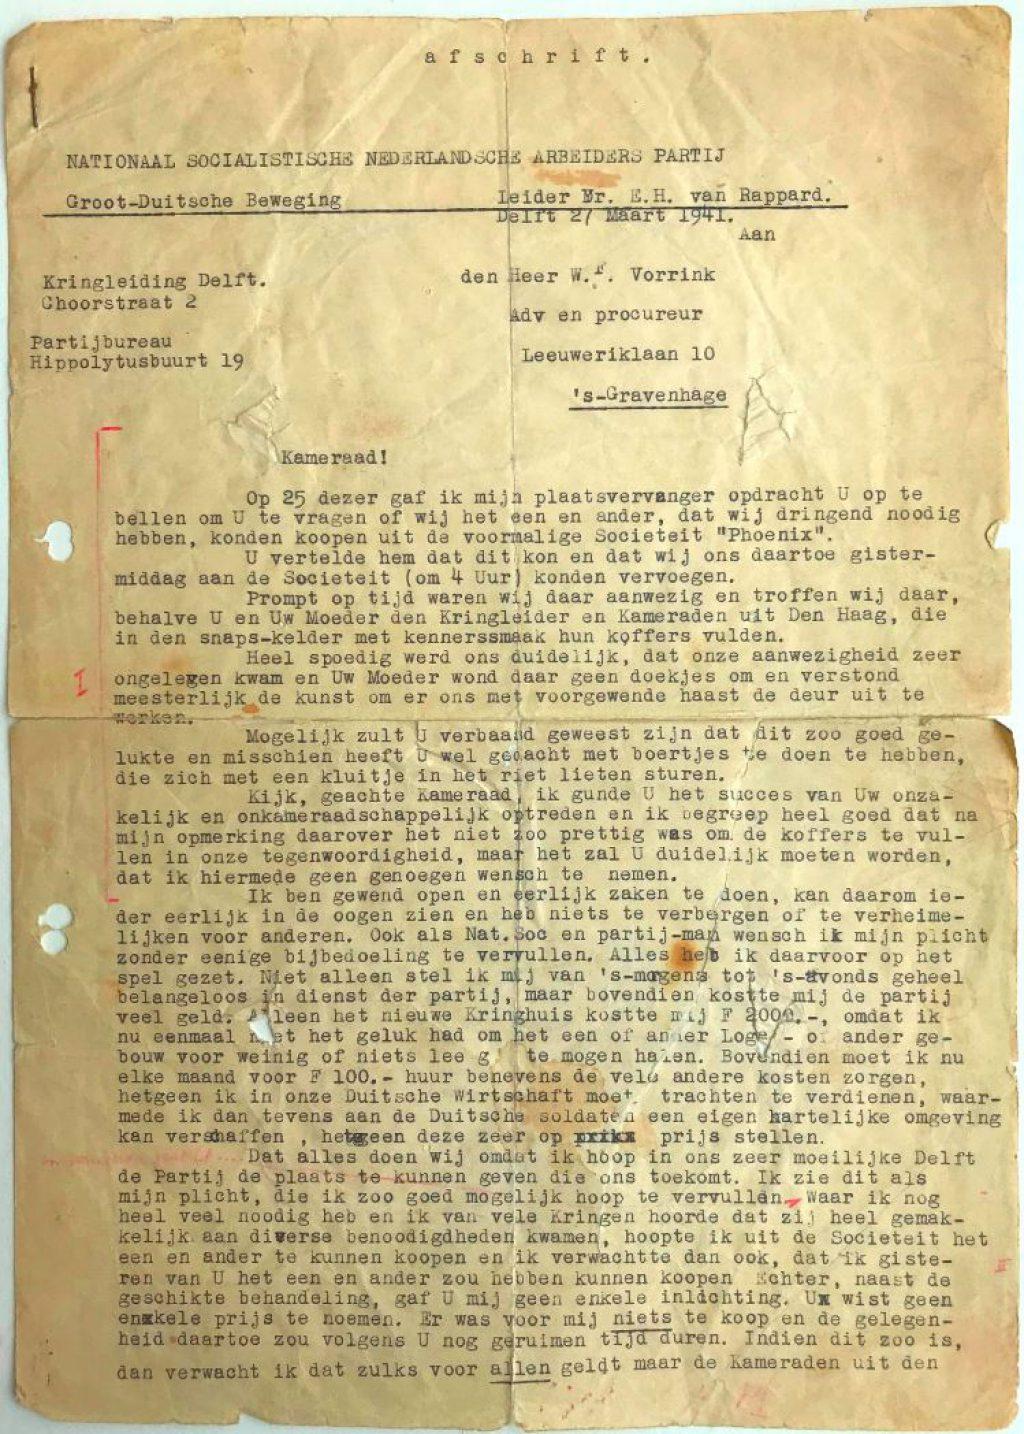 Brief van NSB-kringleider Willem aan W.F. Vorrink, 27-3-1941 (Archief 610, inv.nr 41)